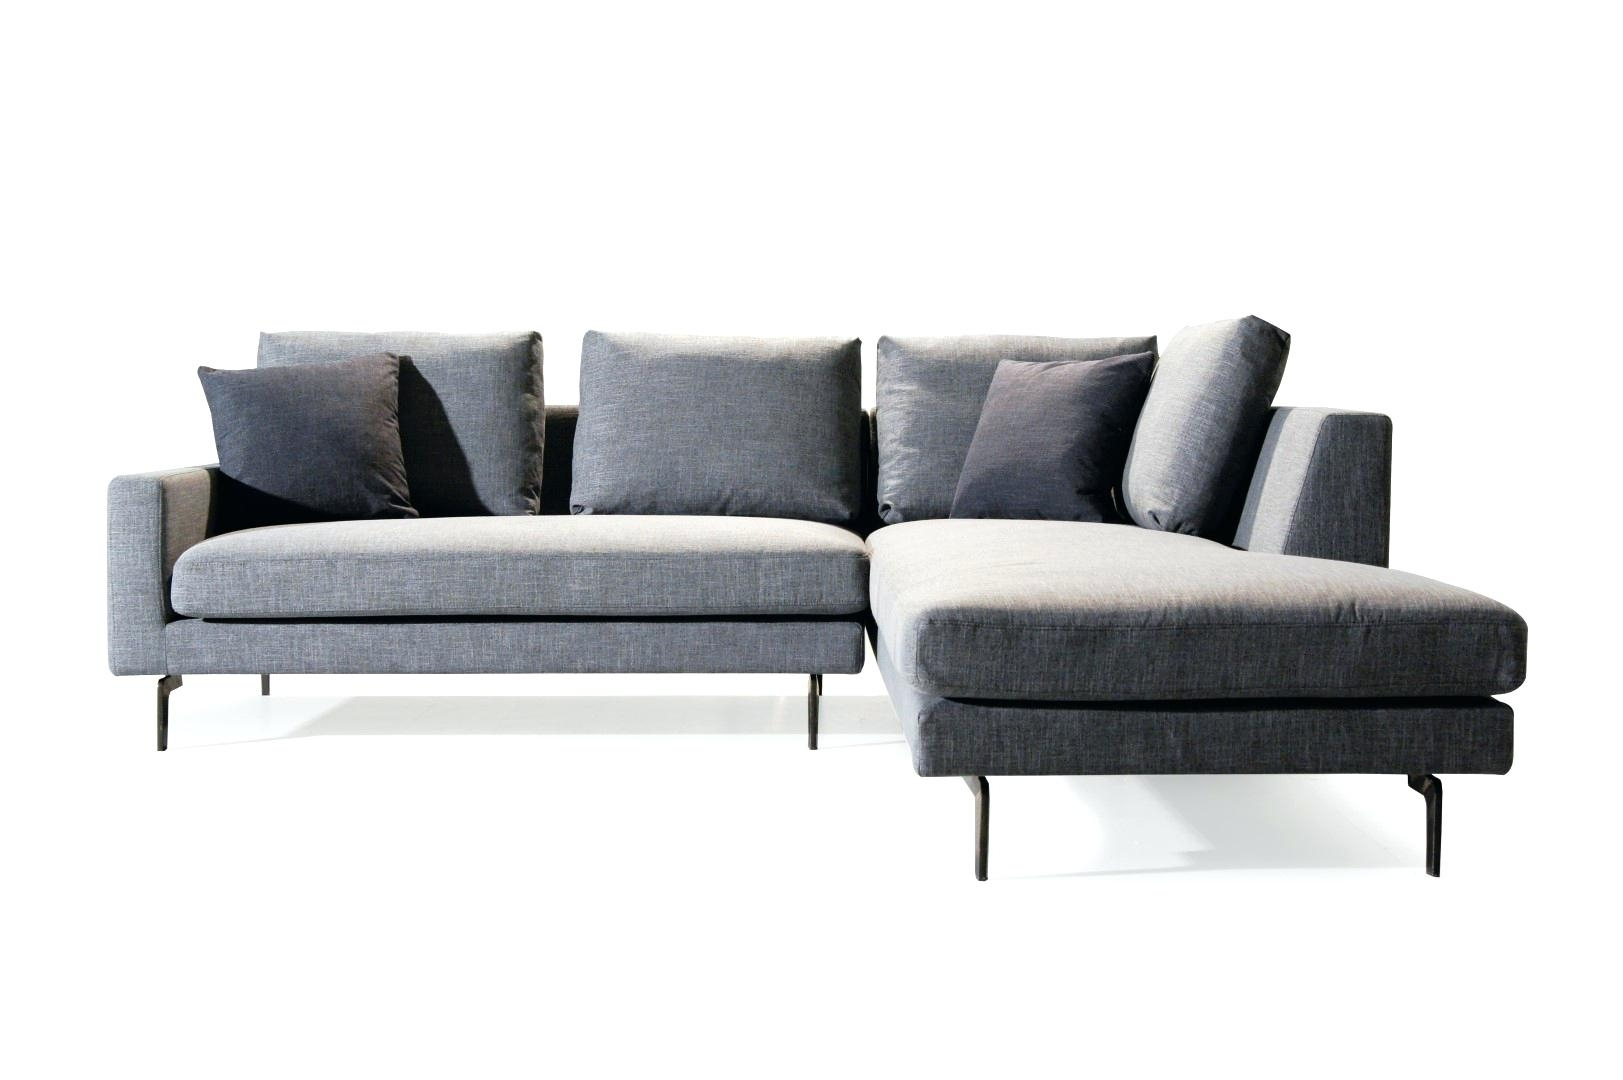 sectional sofas kijiji calgary single sofa chair malaysia 10 photos ideas